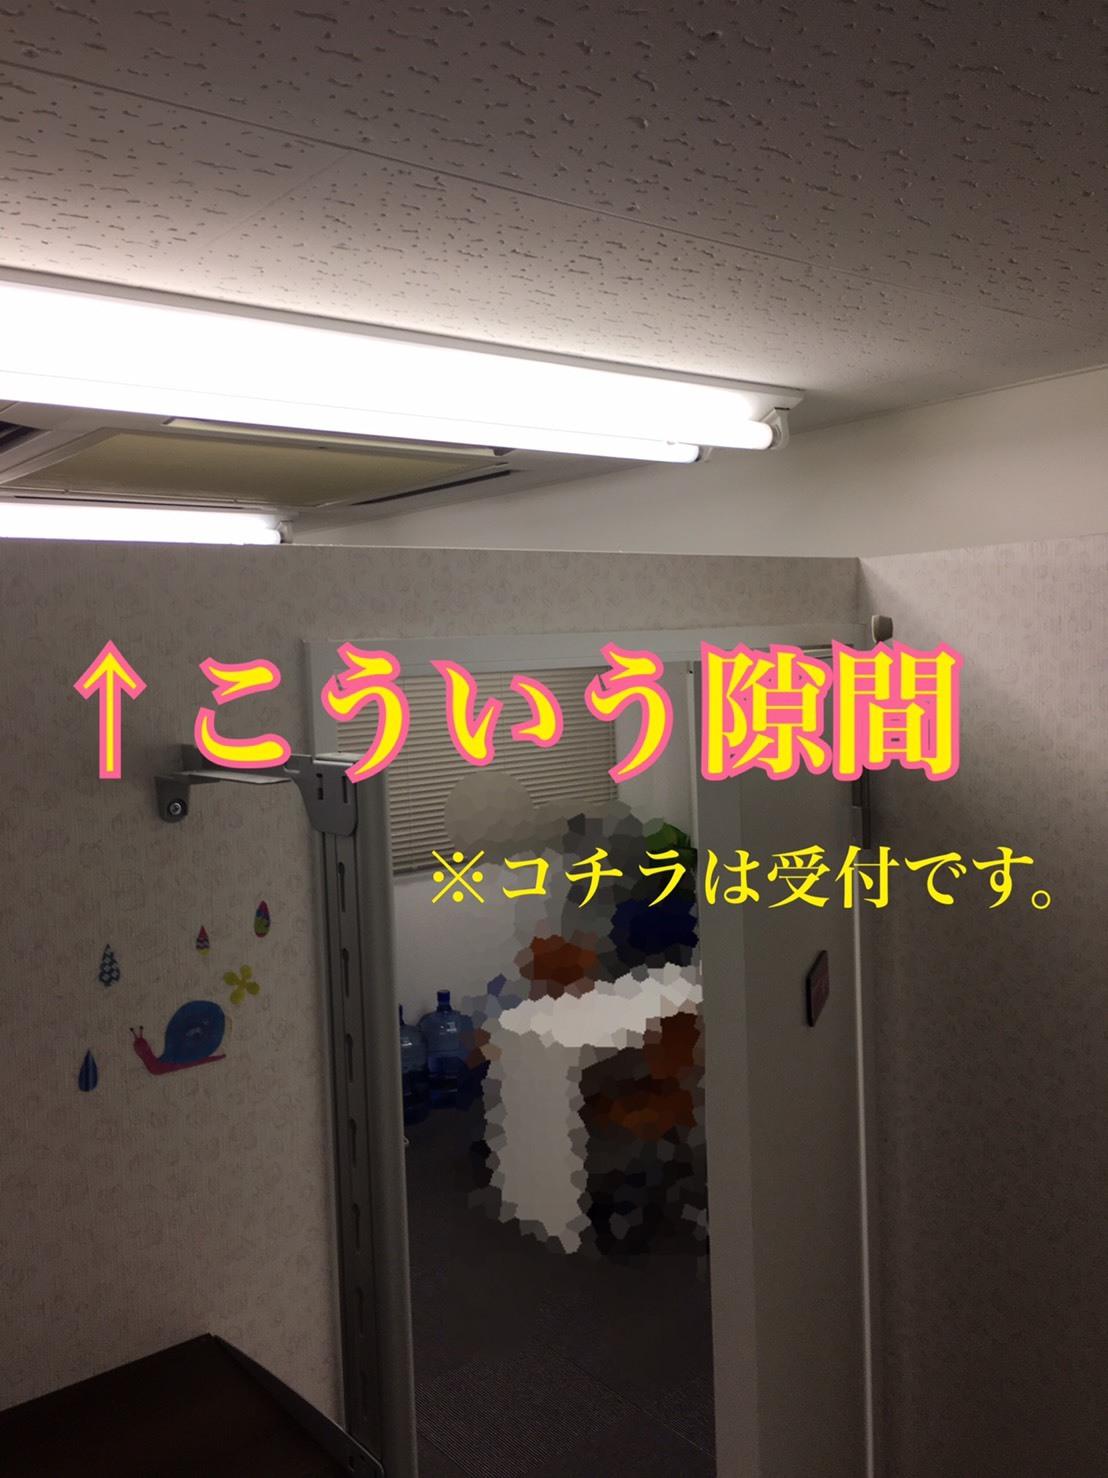 S__34979844.jpg